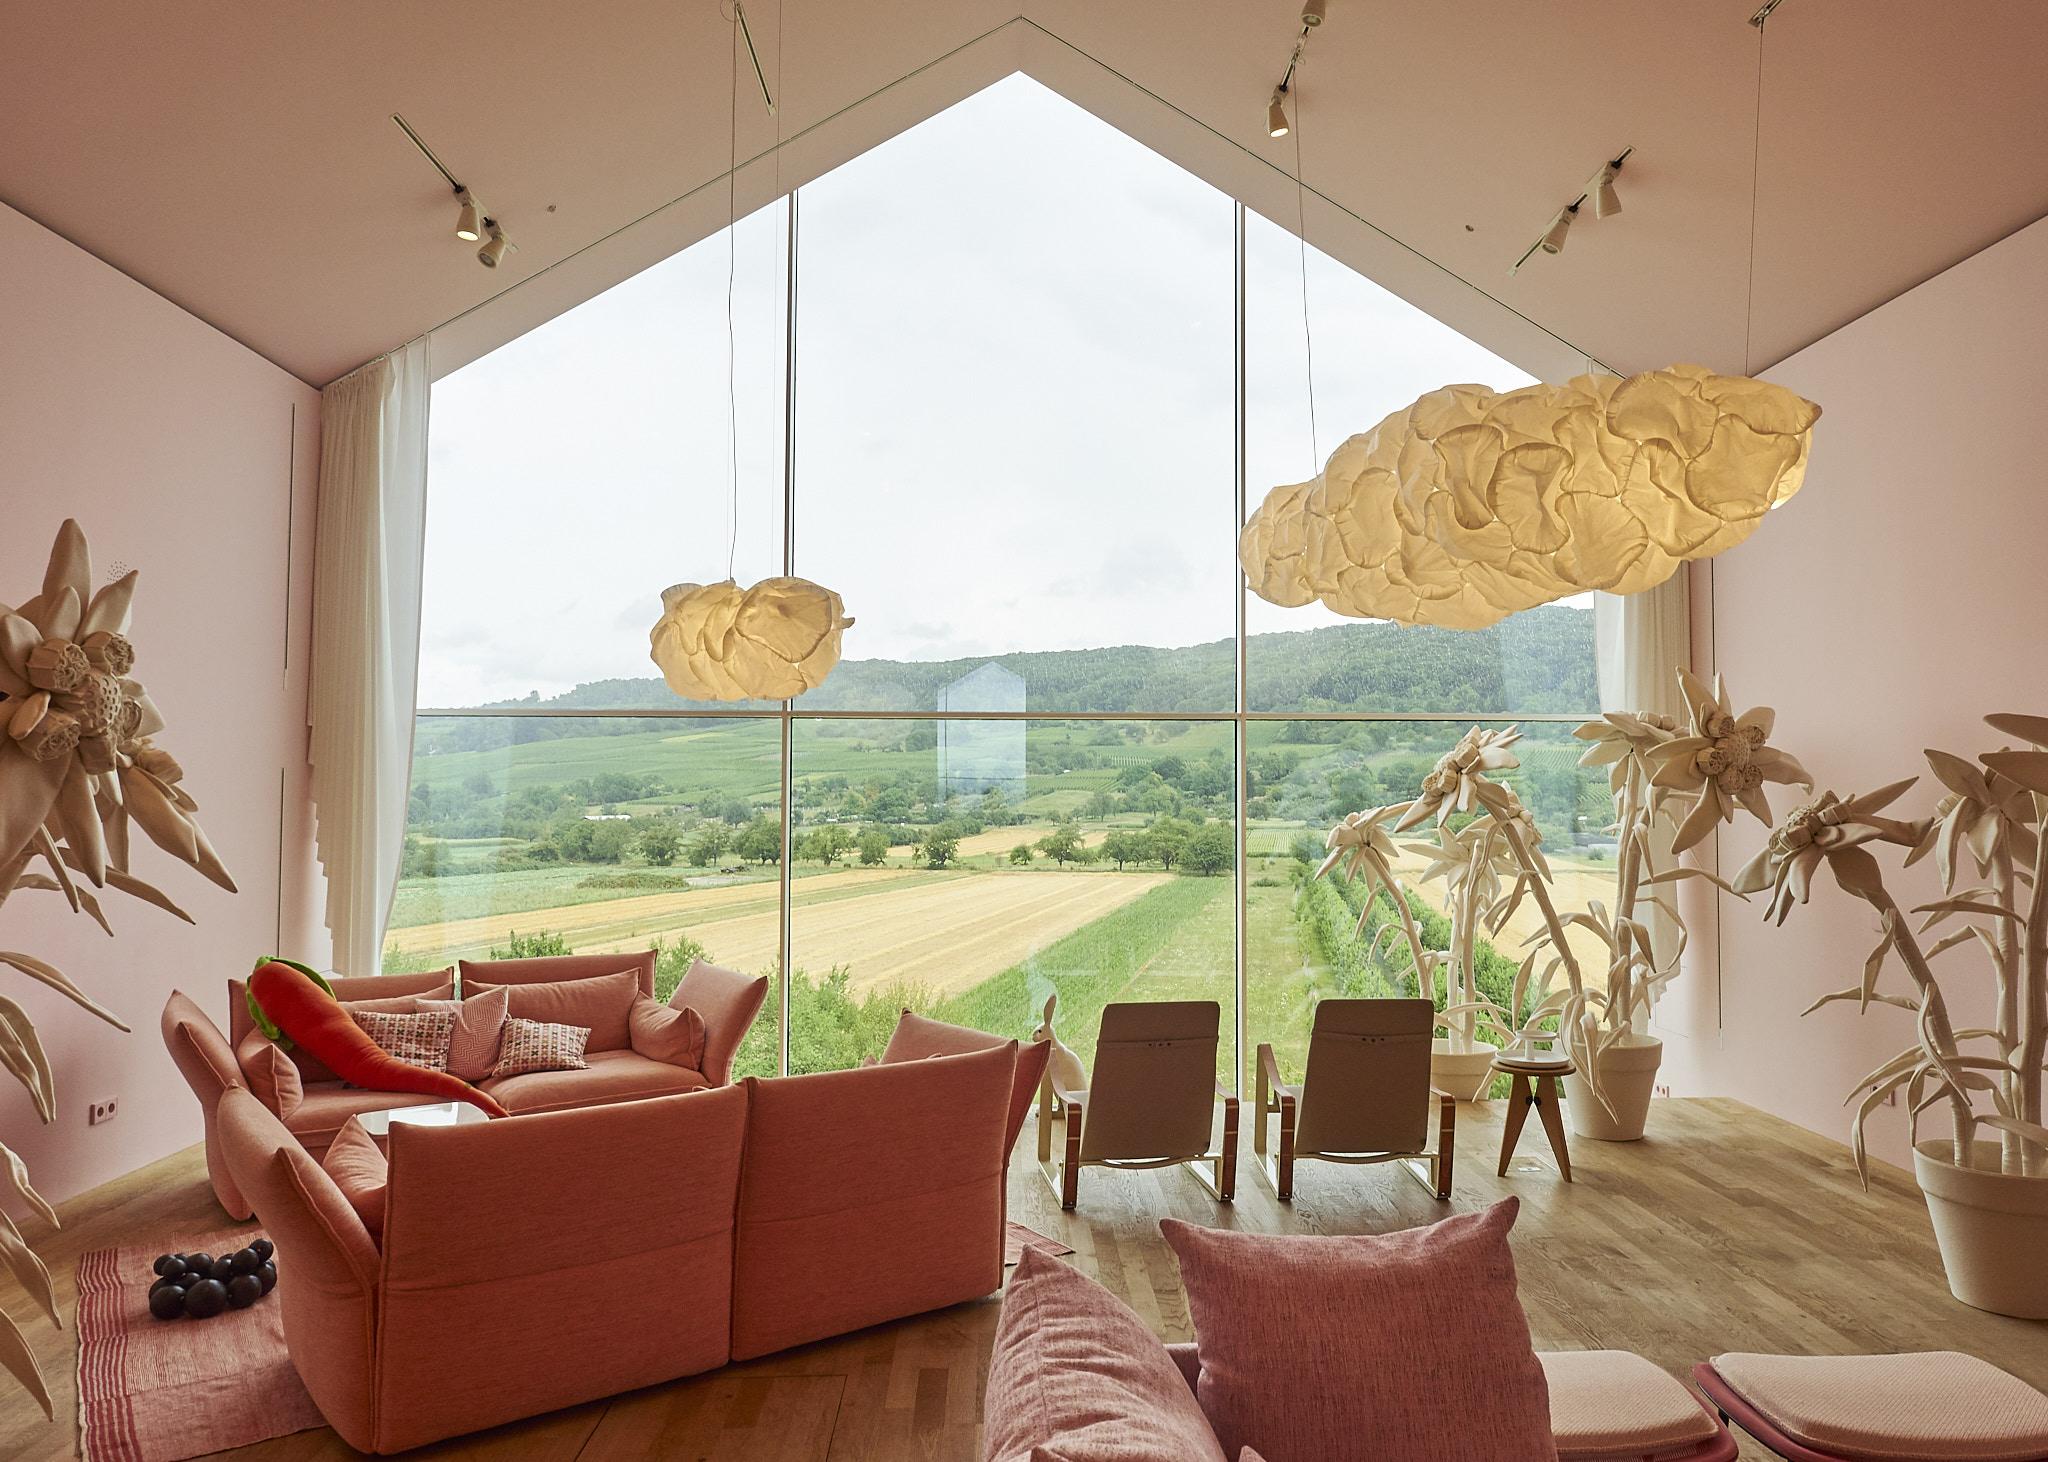 deutschland vitra design museum living in a box. Black Bedroom Furniture Sets. Home Design Ideas